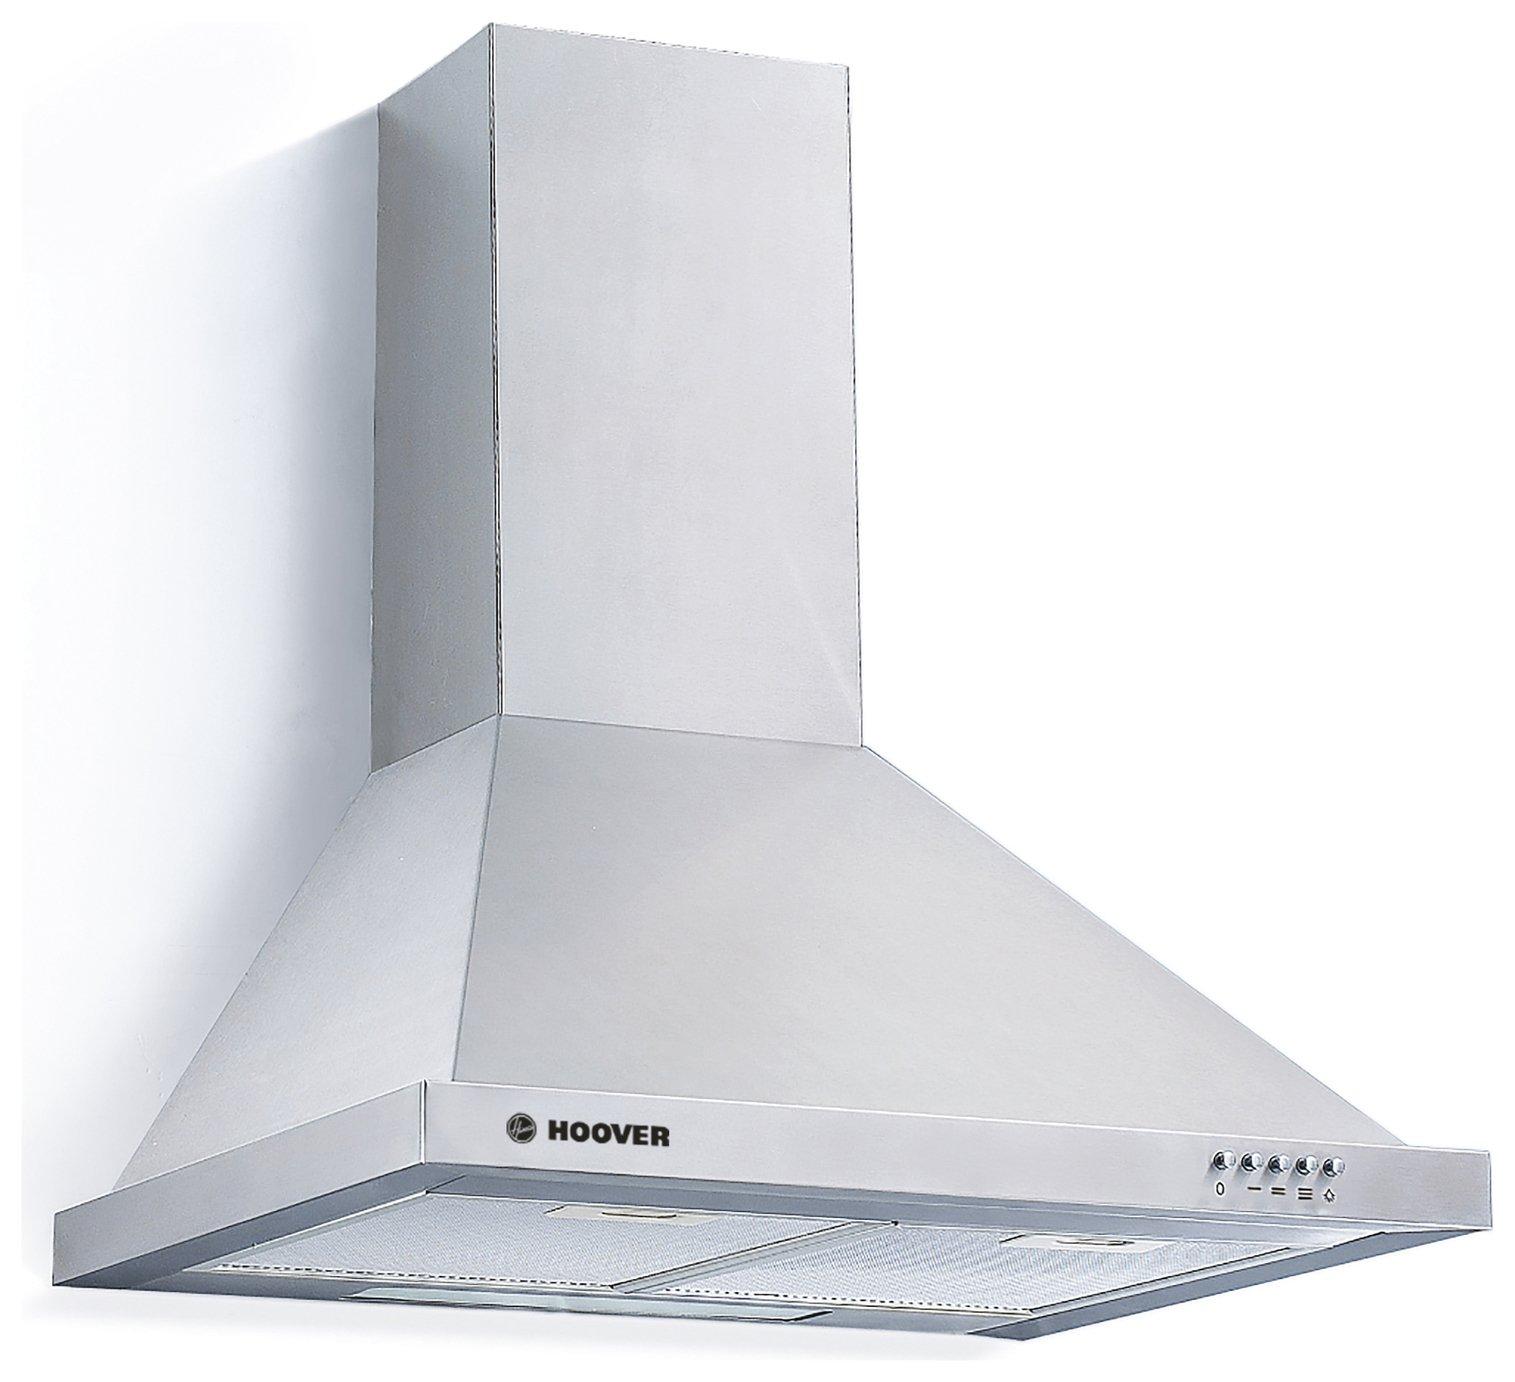 Hoover H-HOOD 300 HCE160X Cooker Hood - Stainless Steel